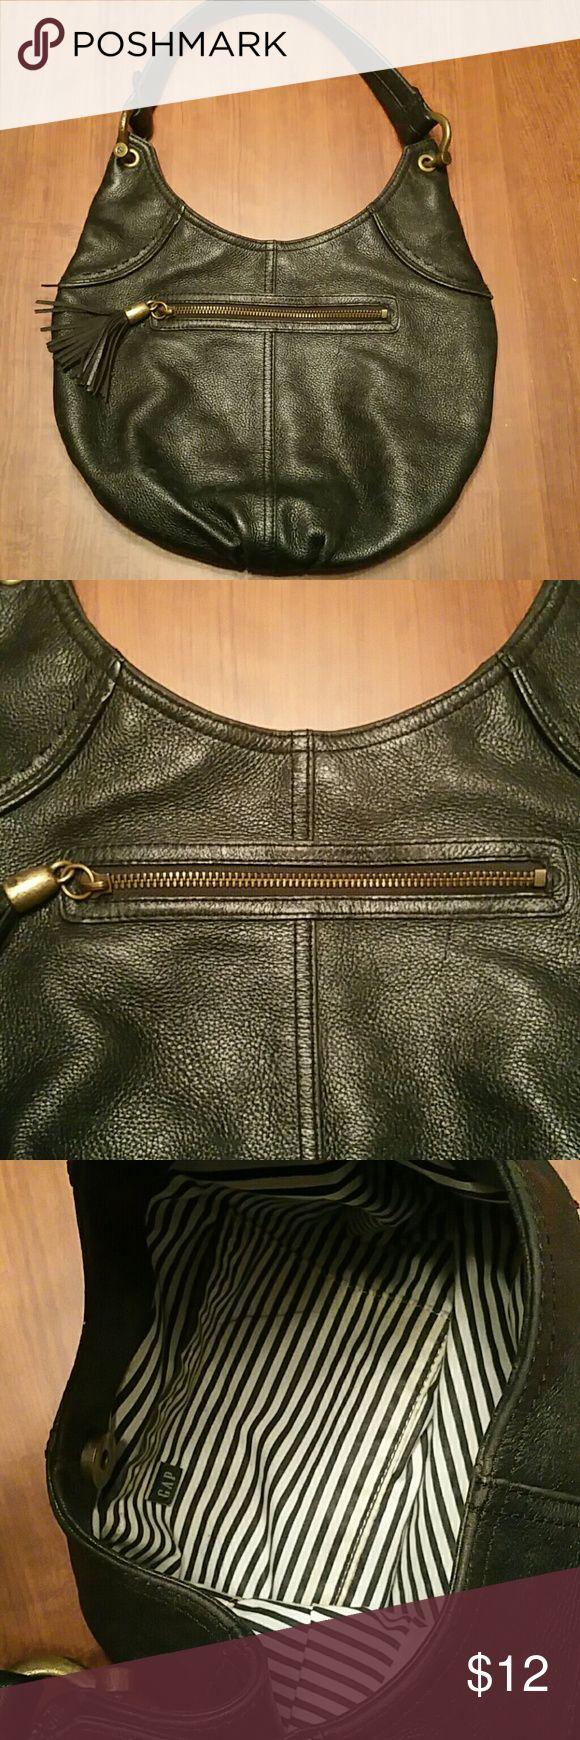 GAP Purse Black Leather GAP Purse GAP Bags Satchels